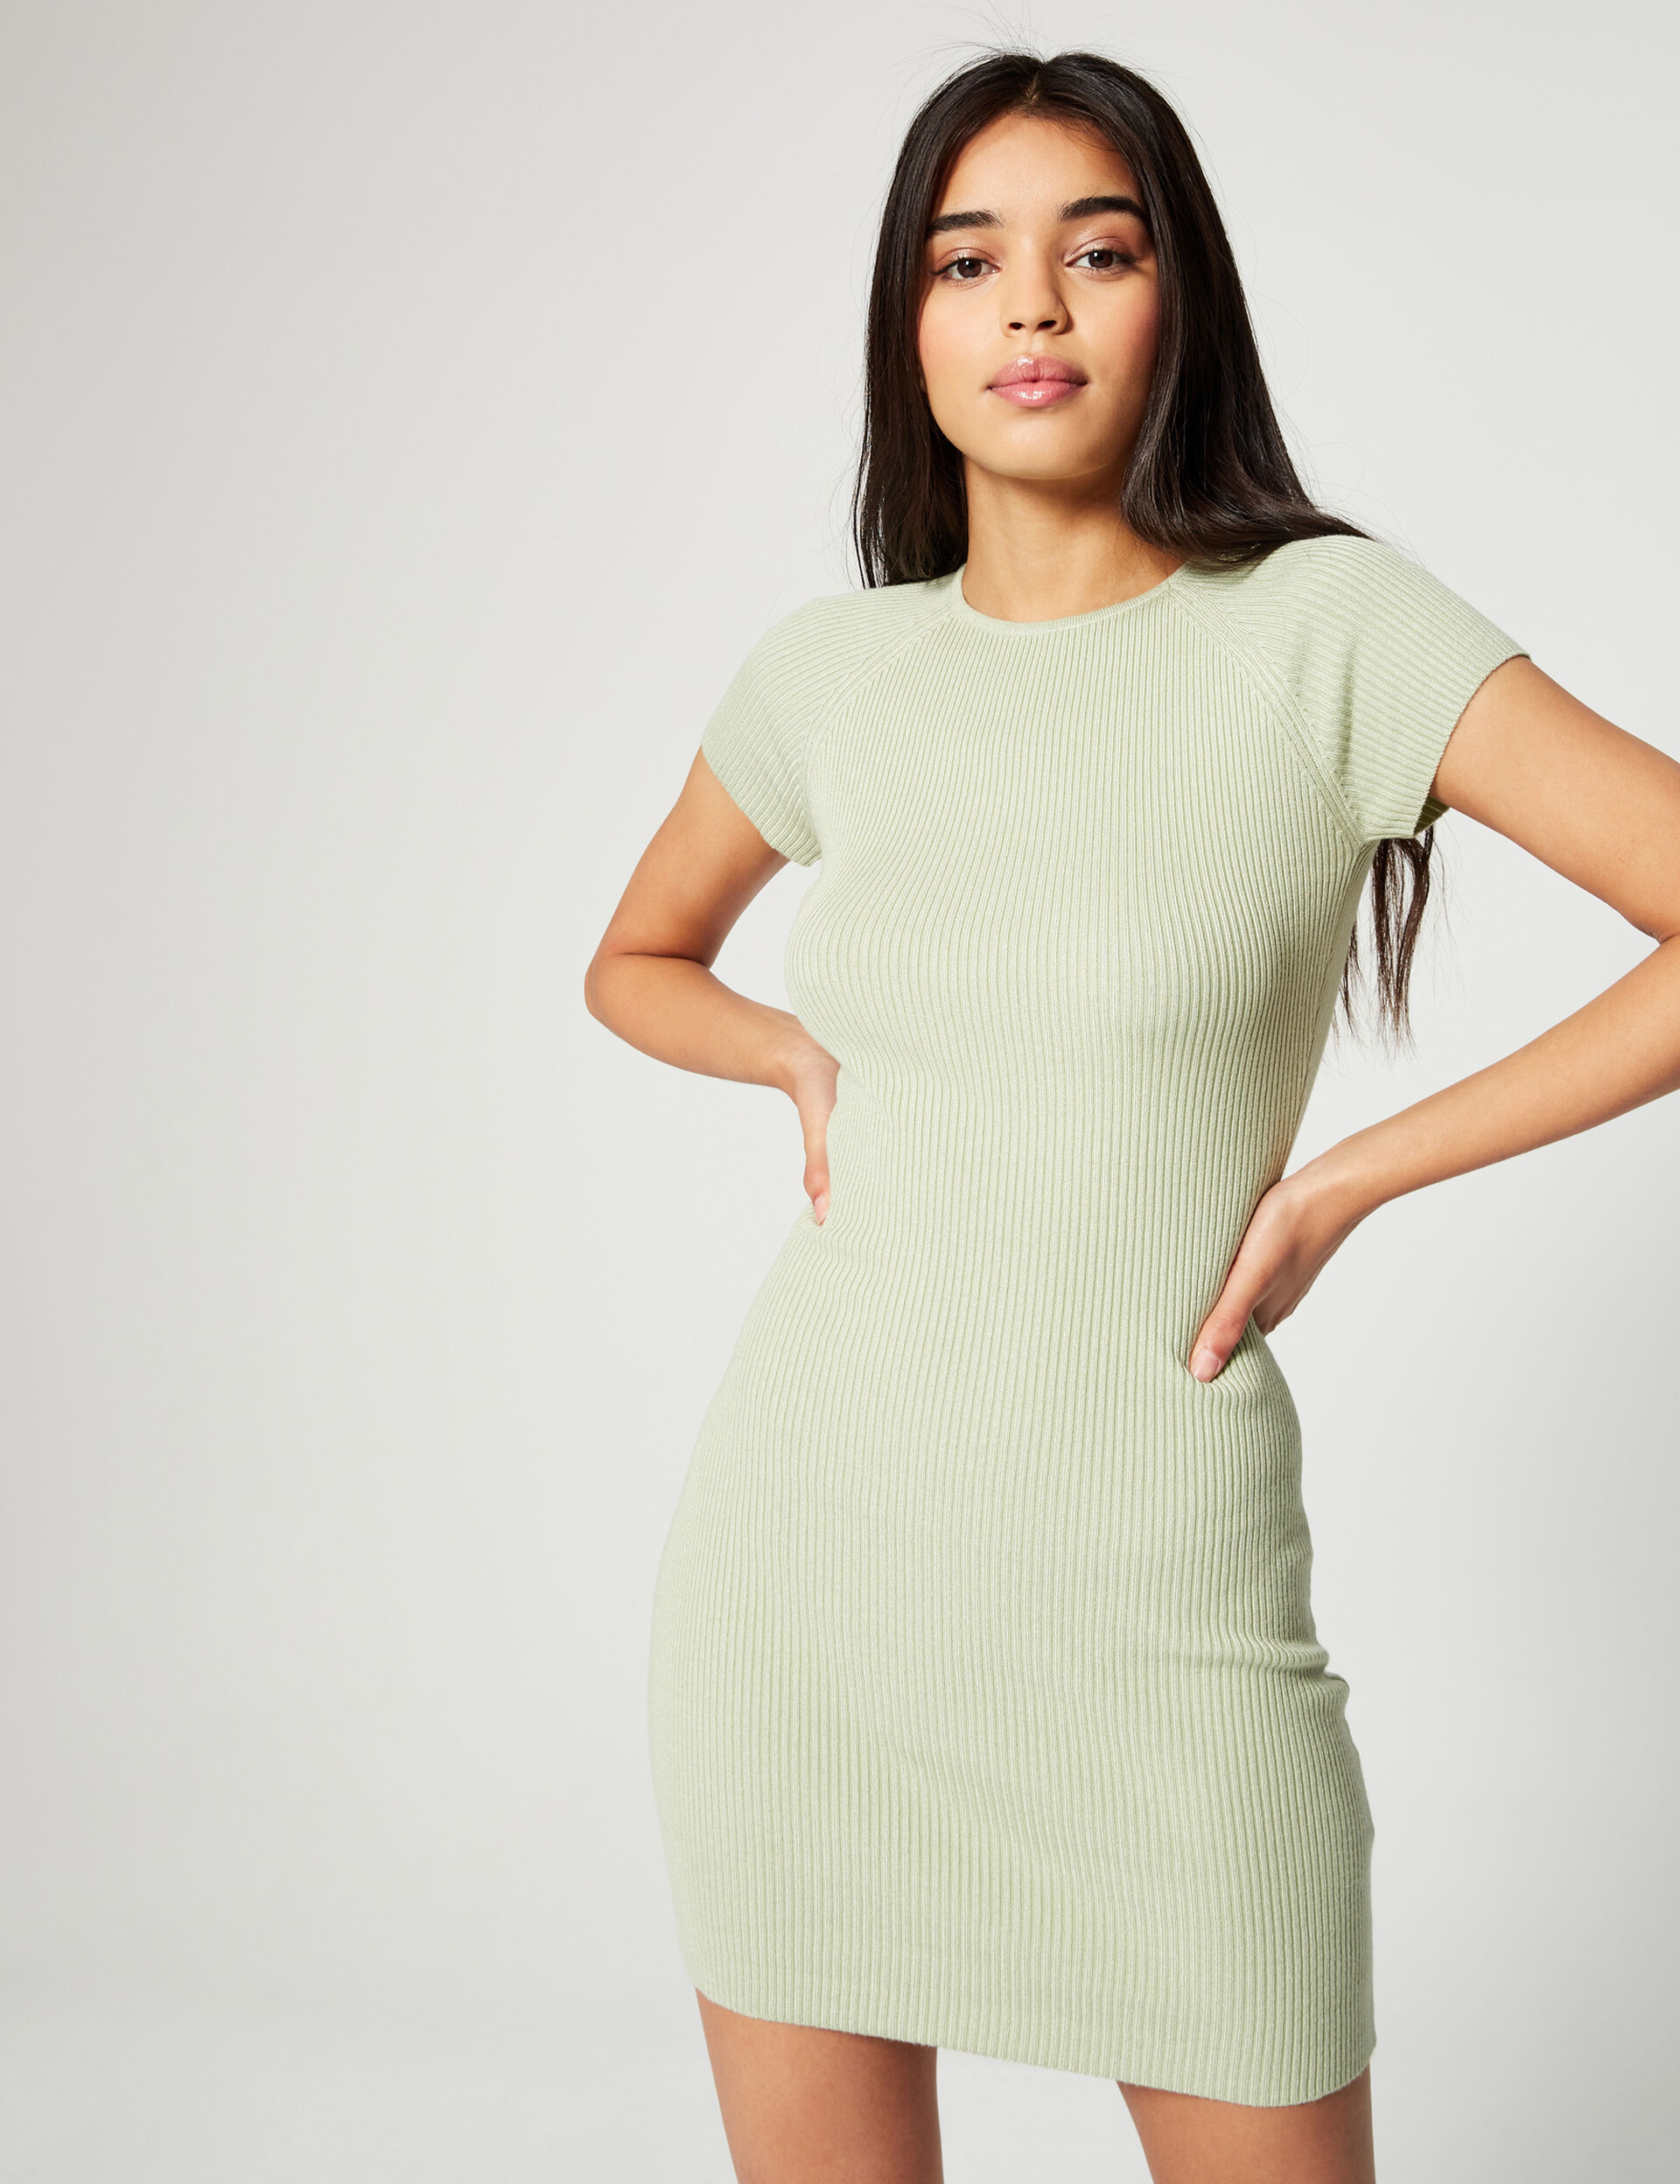 Ribbed jumper dress